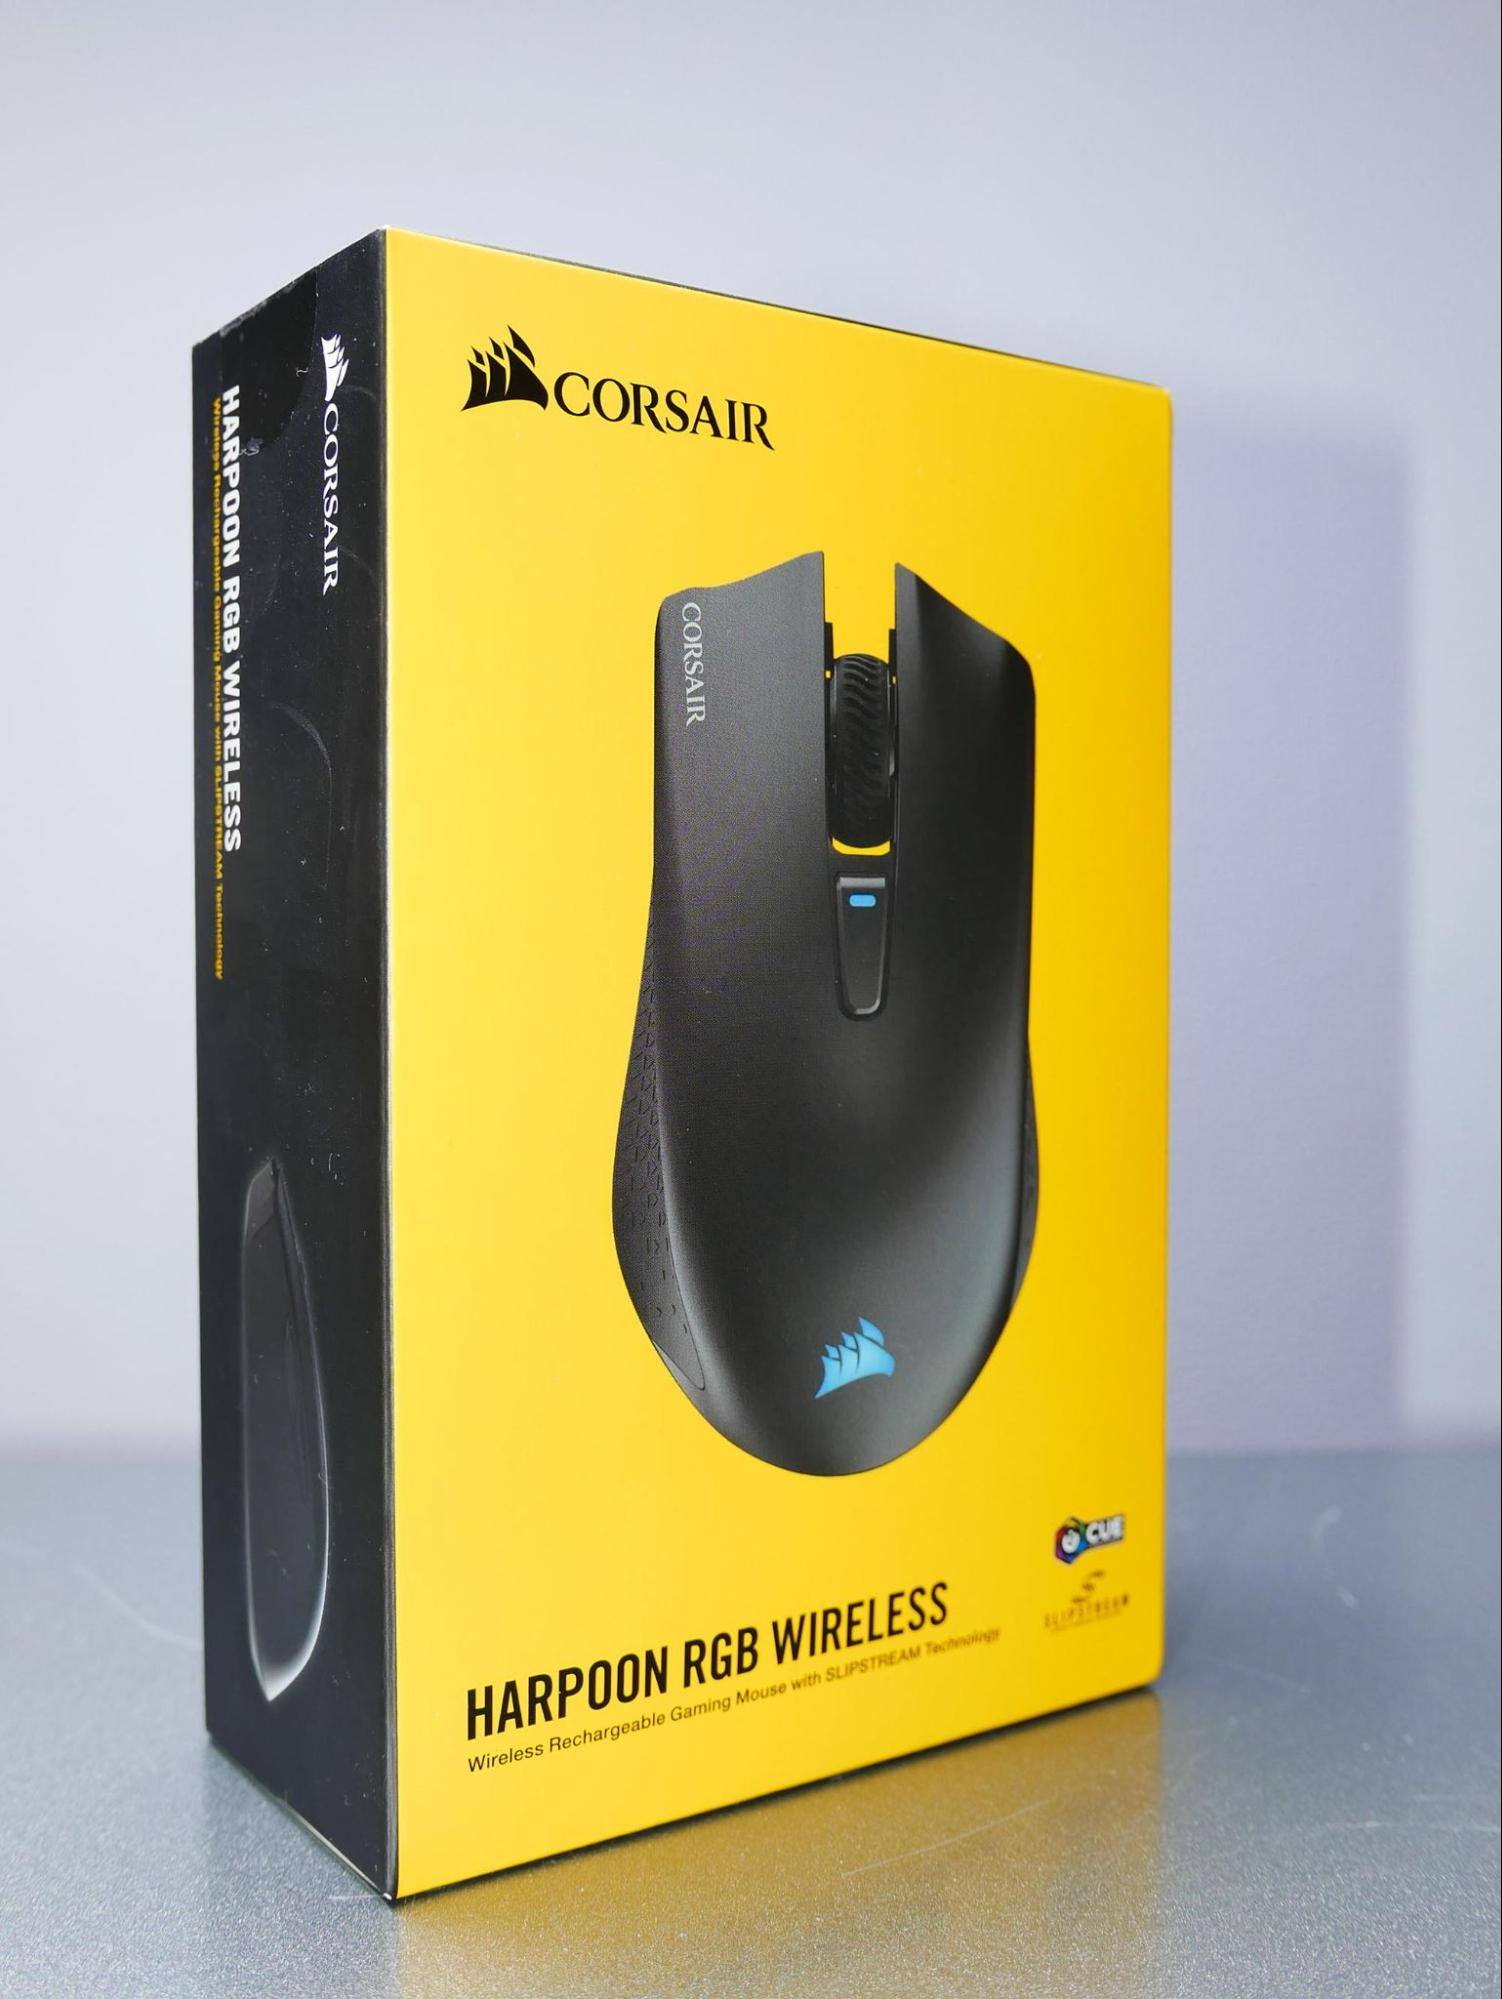 Corsair Harpoon RGB  with SteelSeries Gaming Surface